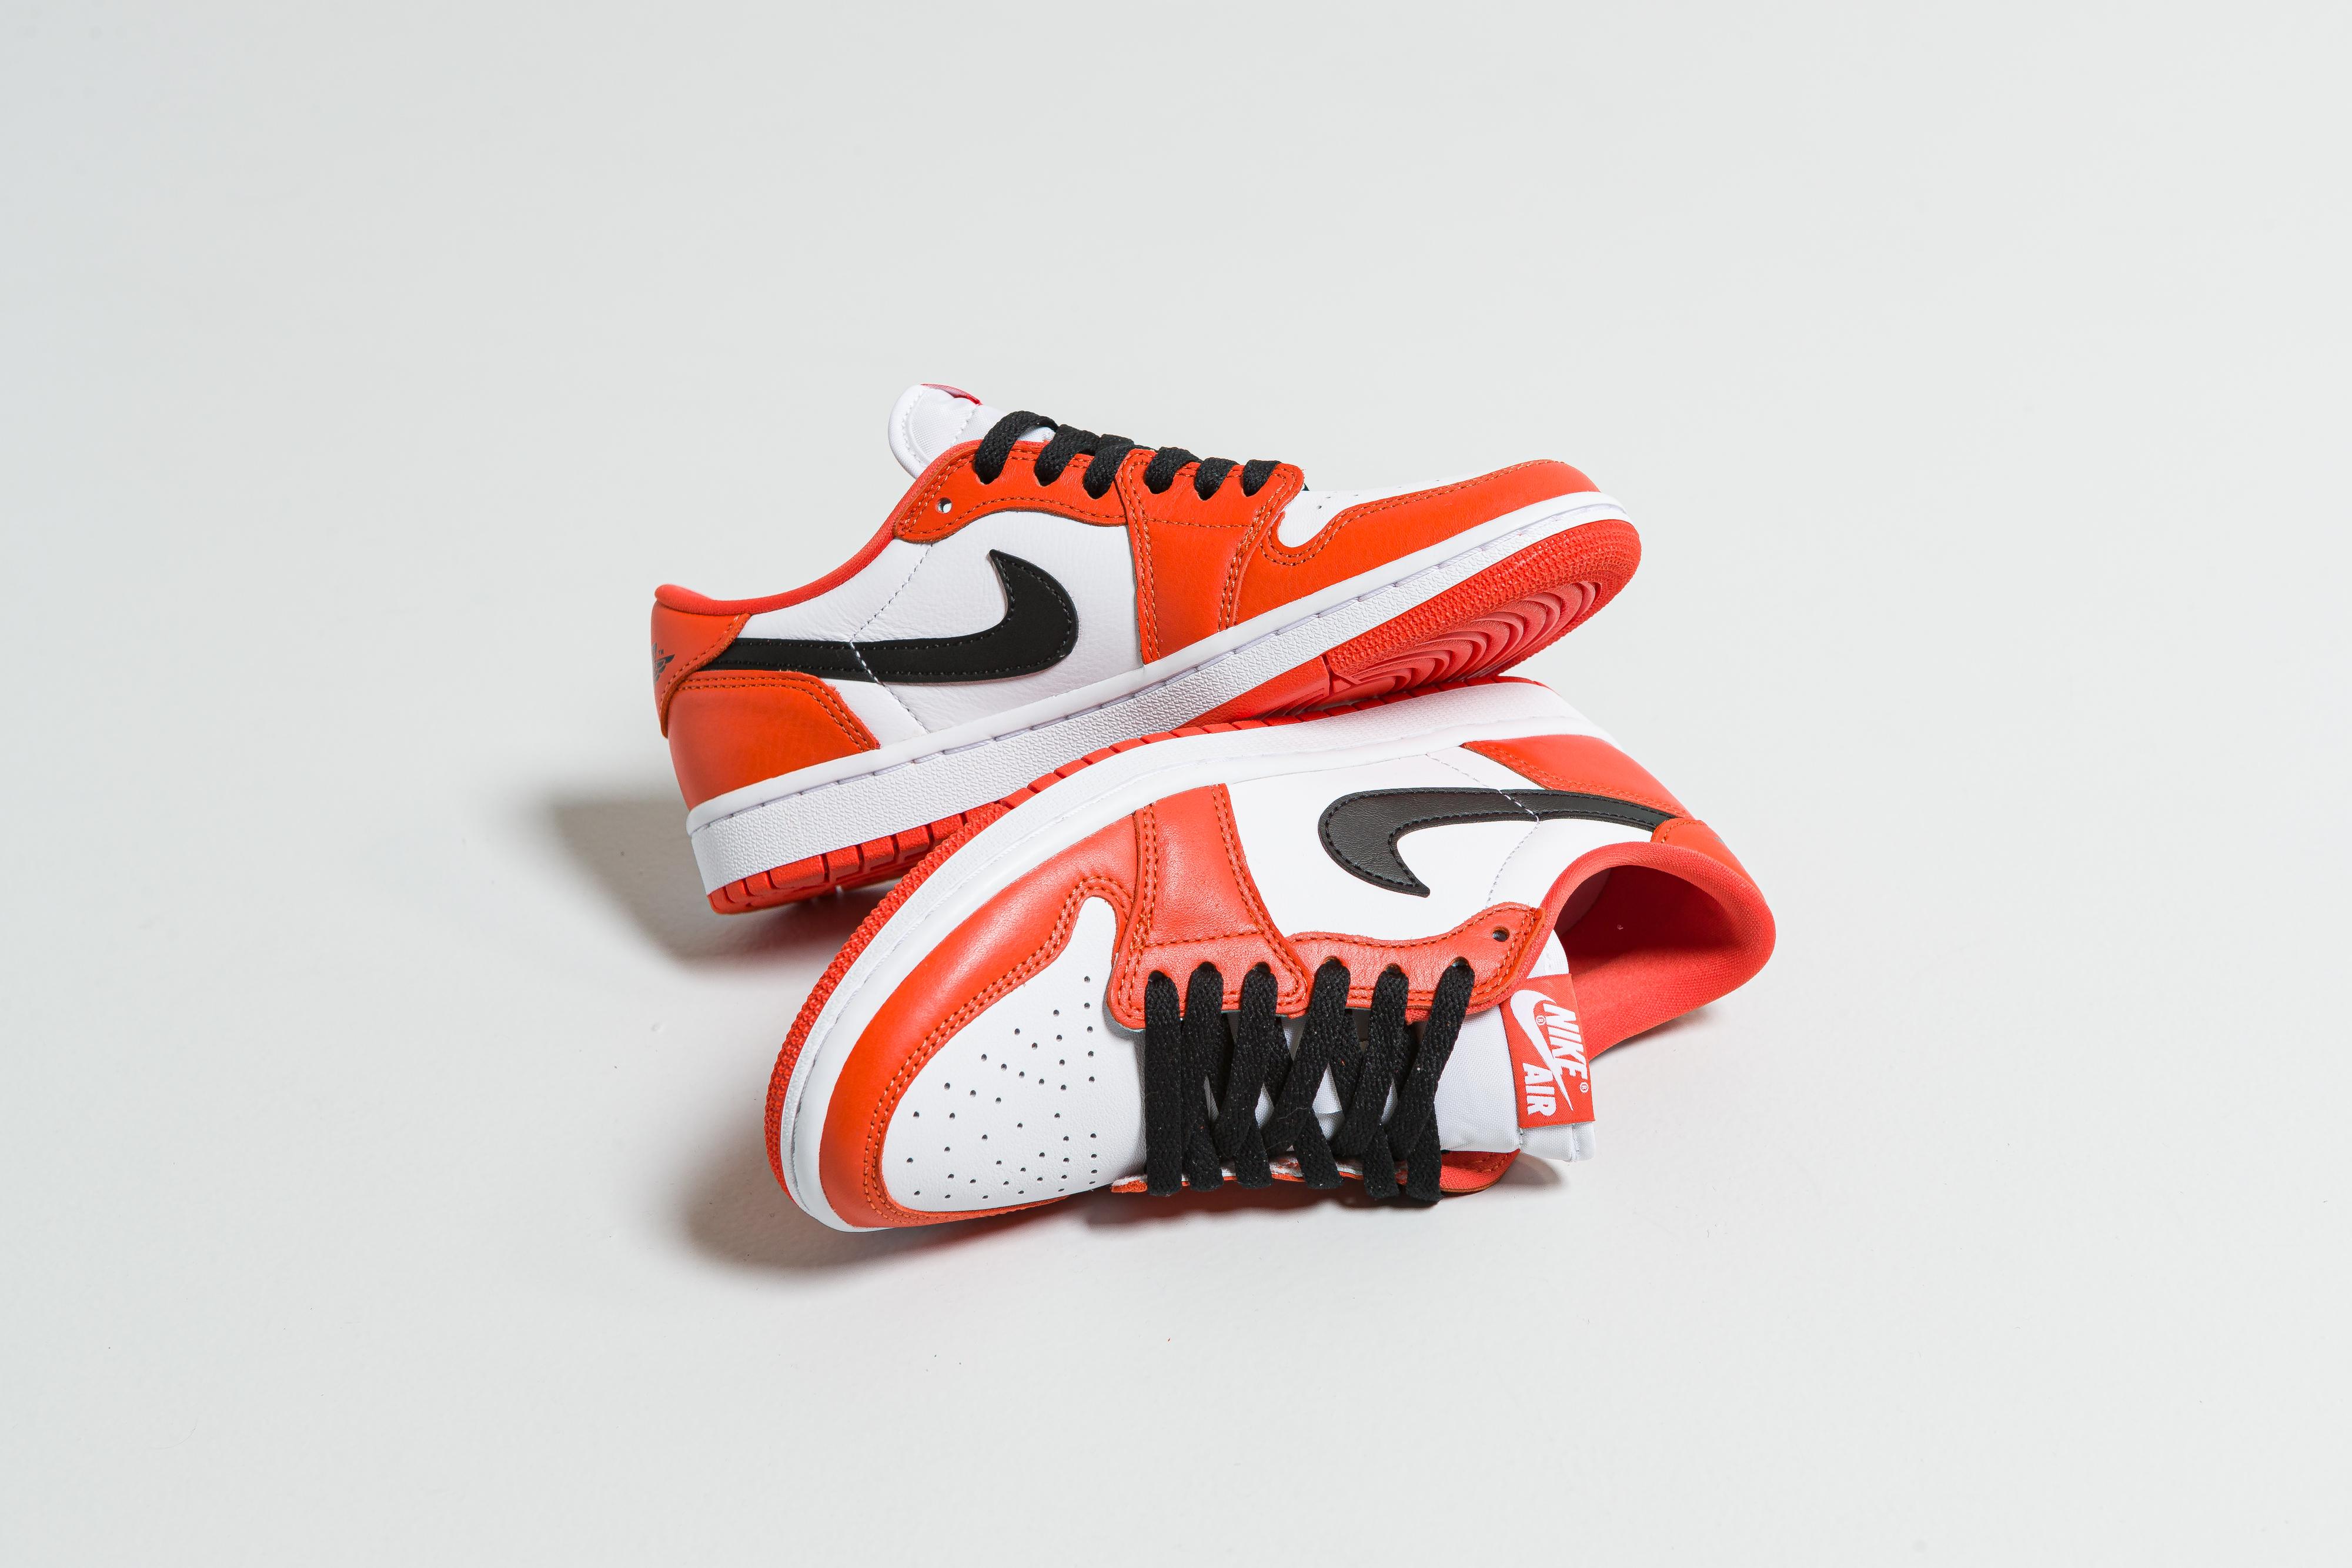 Jordan - Womens Air Jordan 1 Low OG - Orange/Black-White - Up There